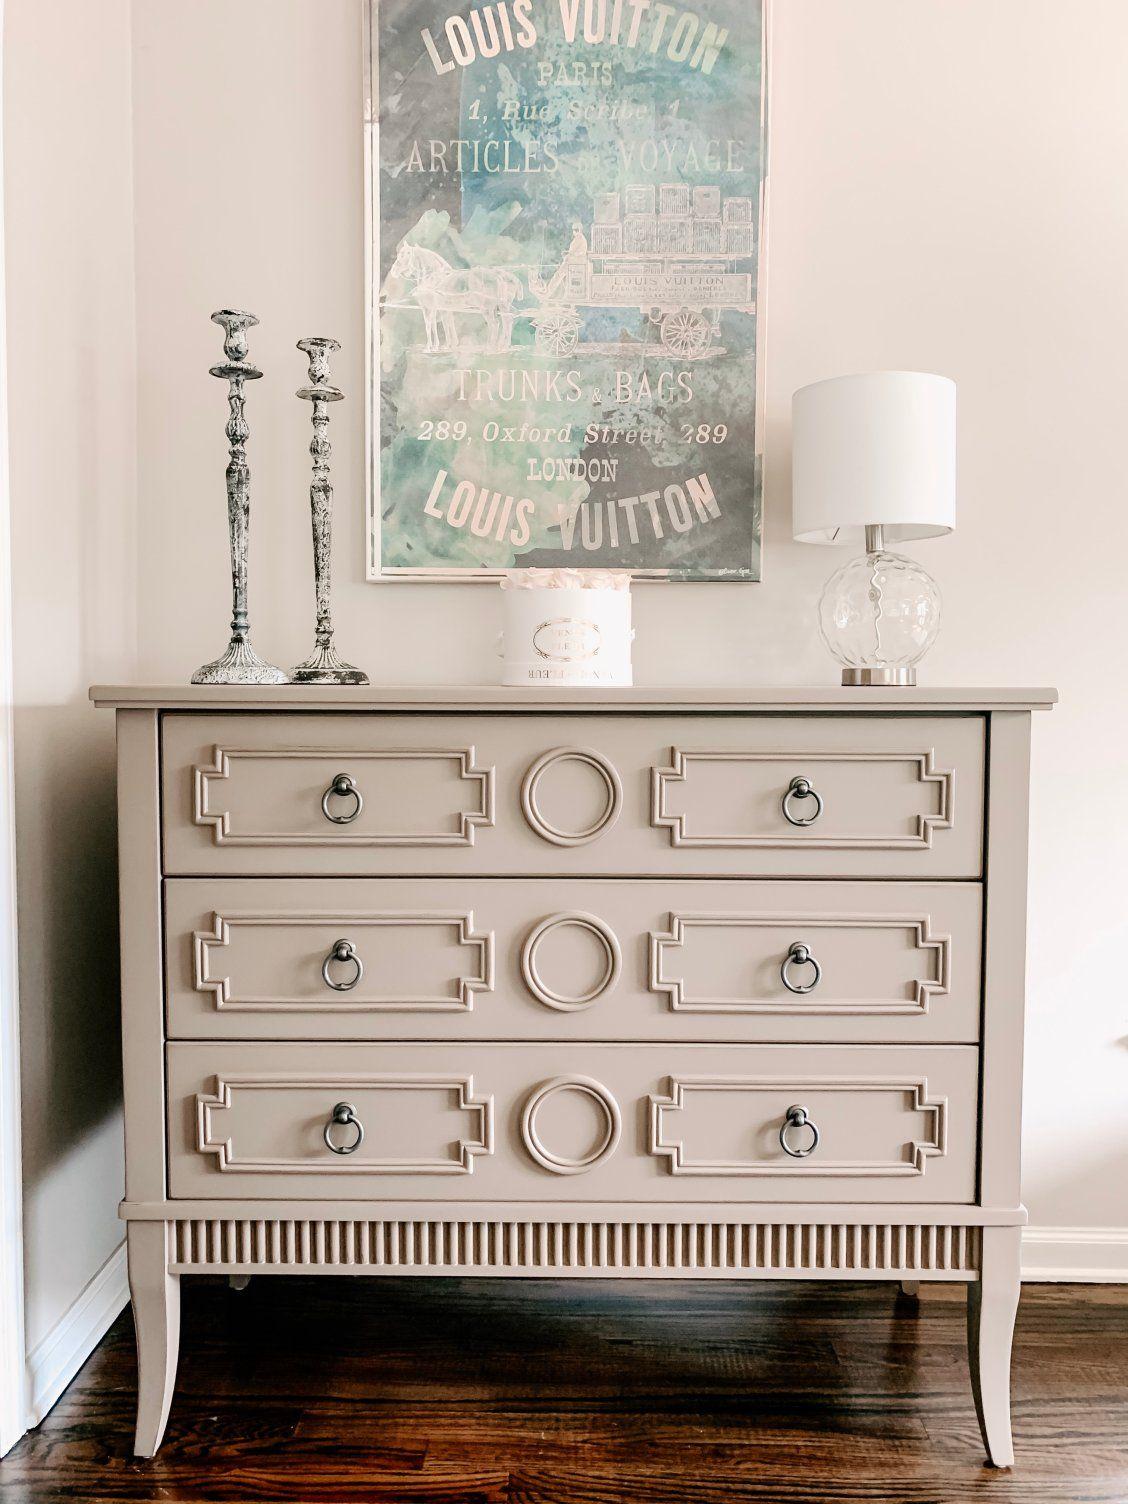 Adrian Accent Chest Furniture makeover, Furniture